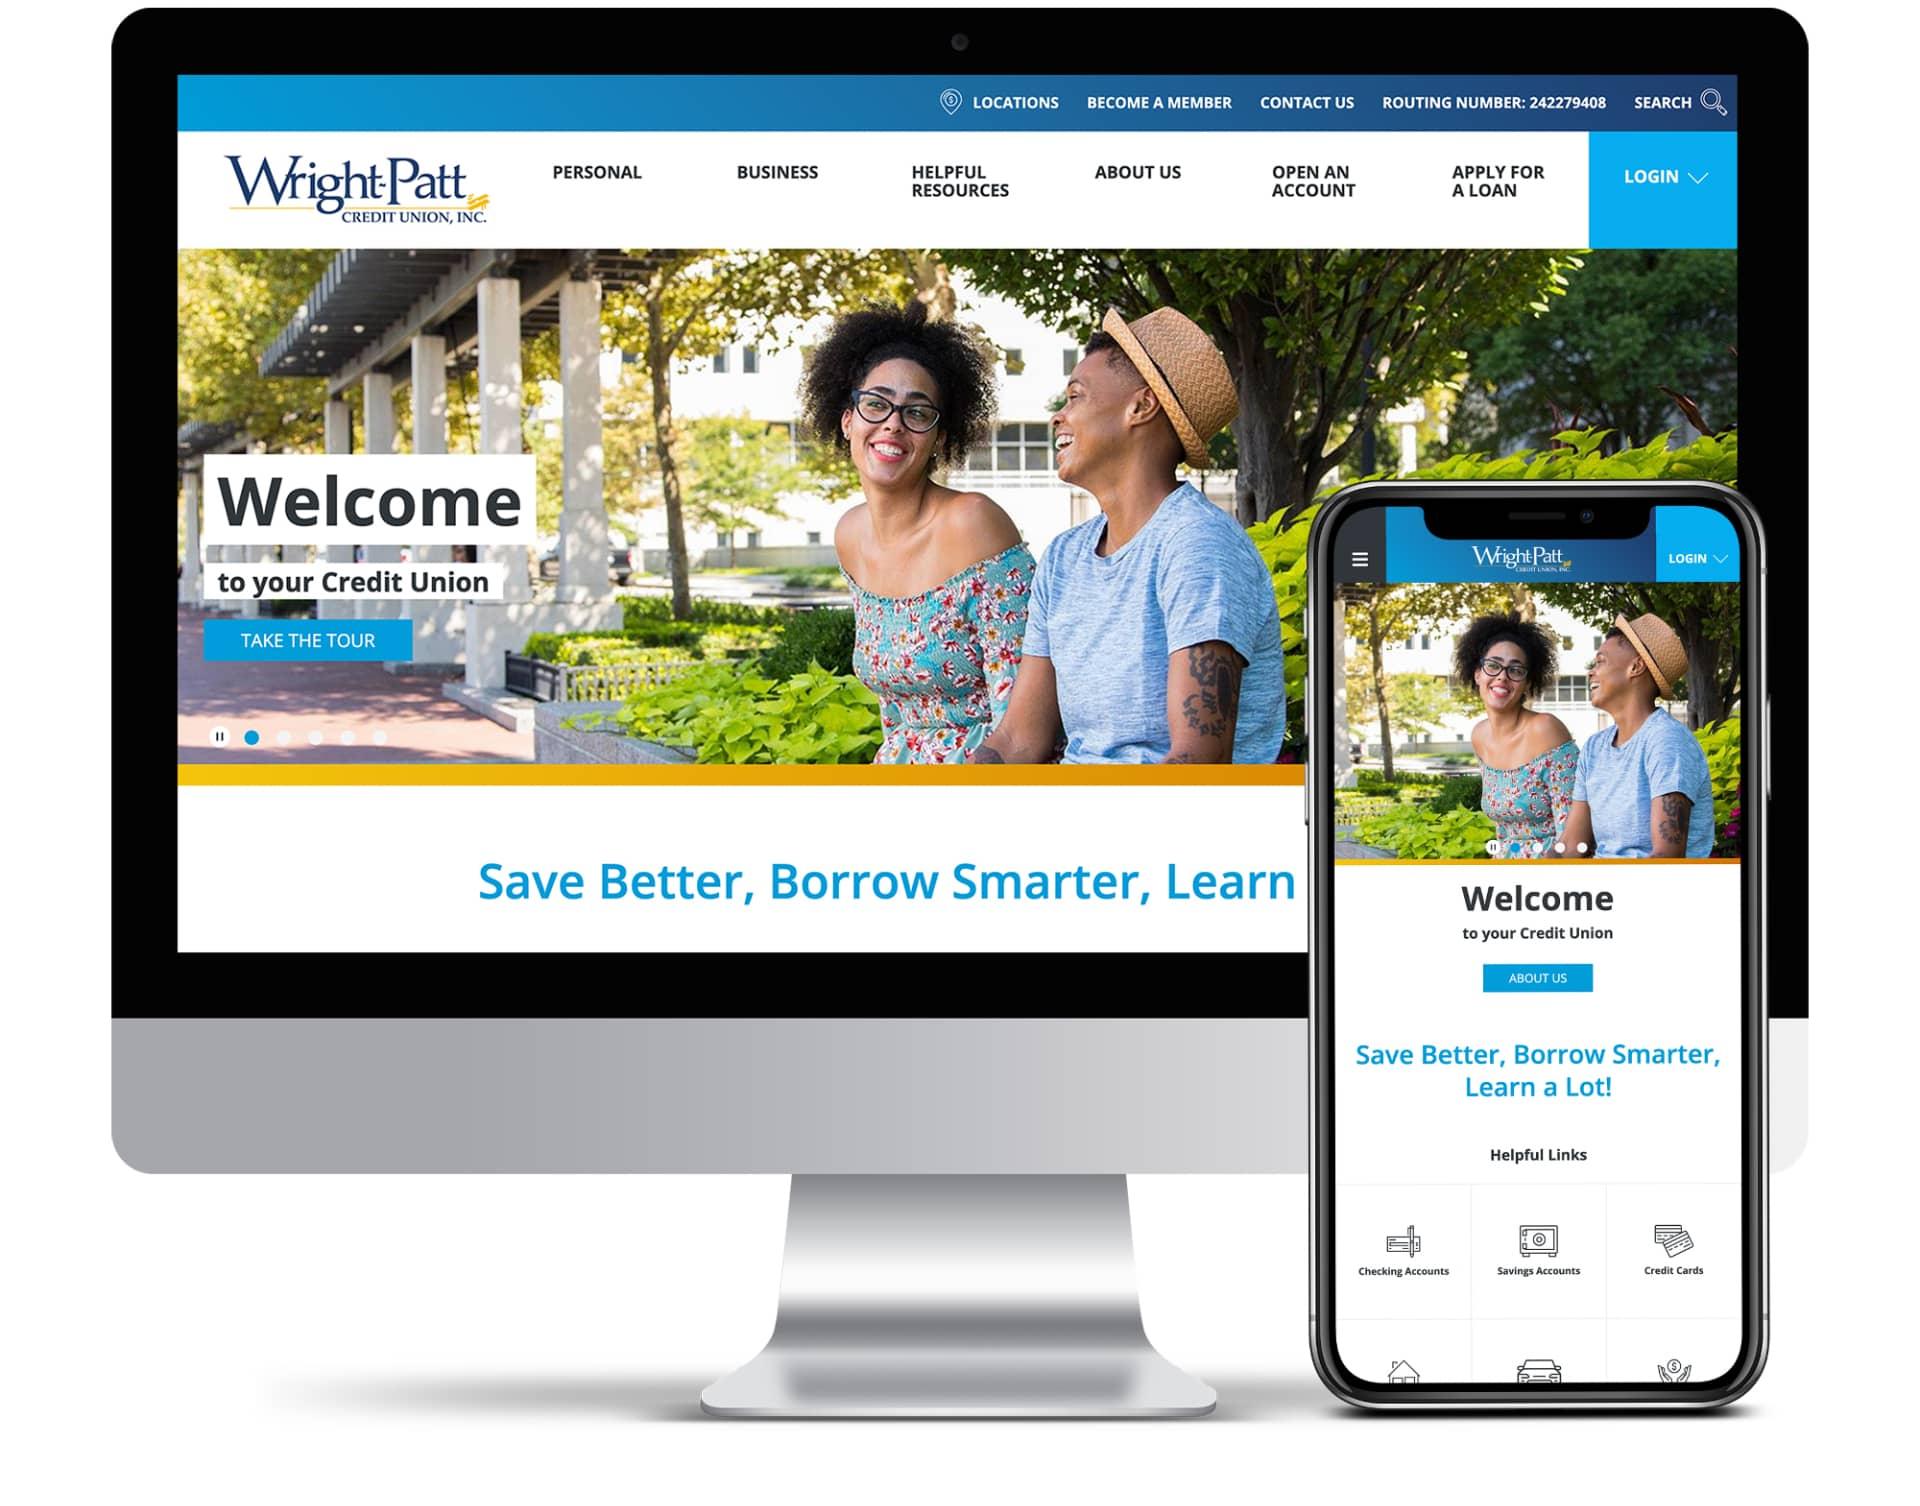 Wright-Patt Credit Union website screenshots